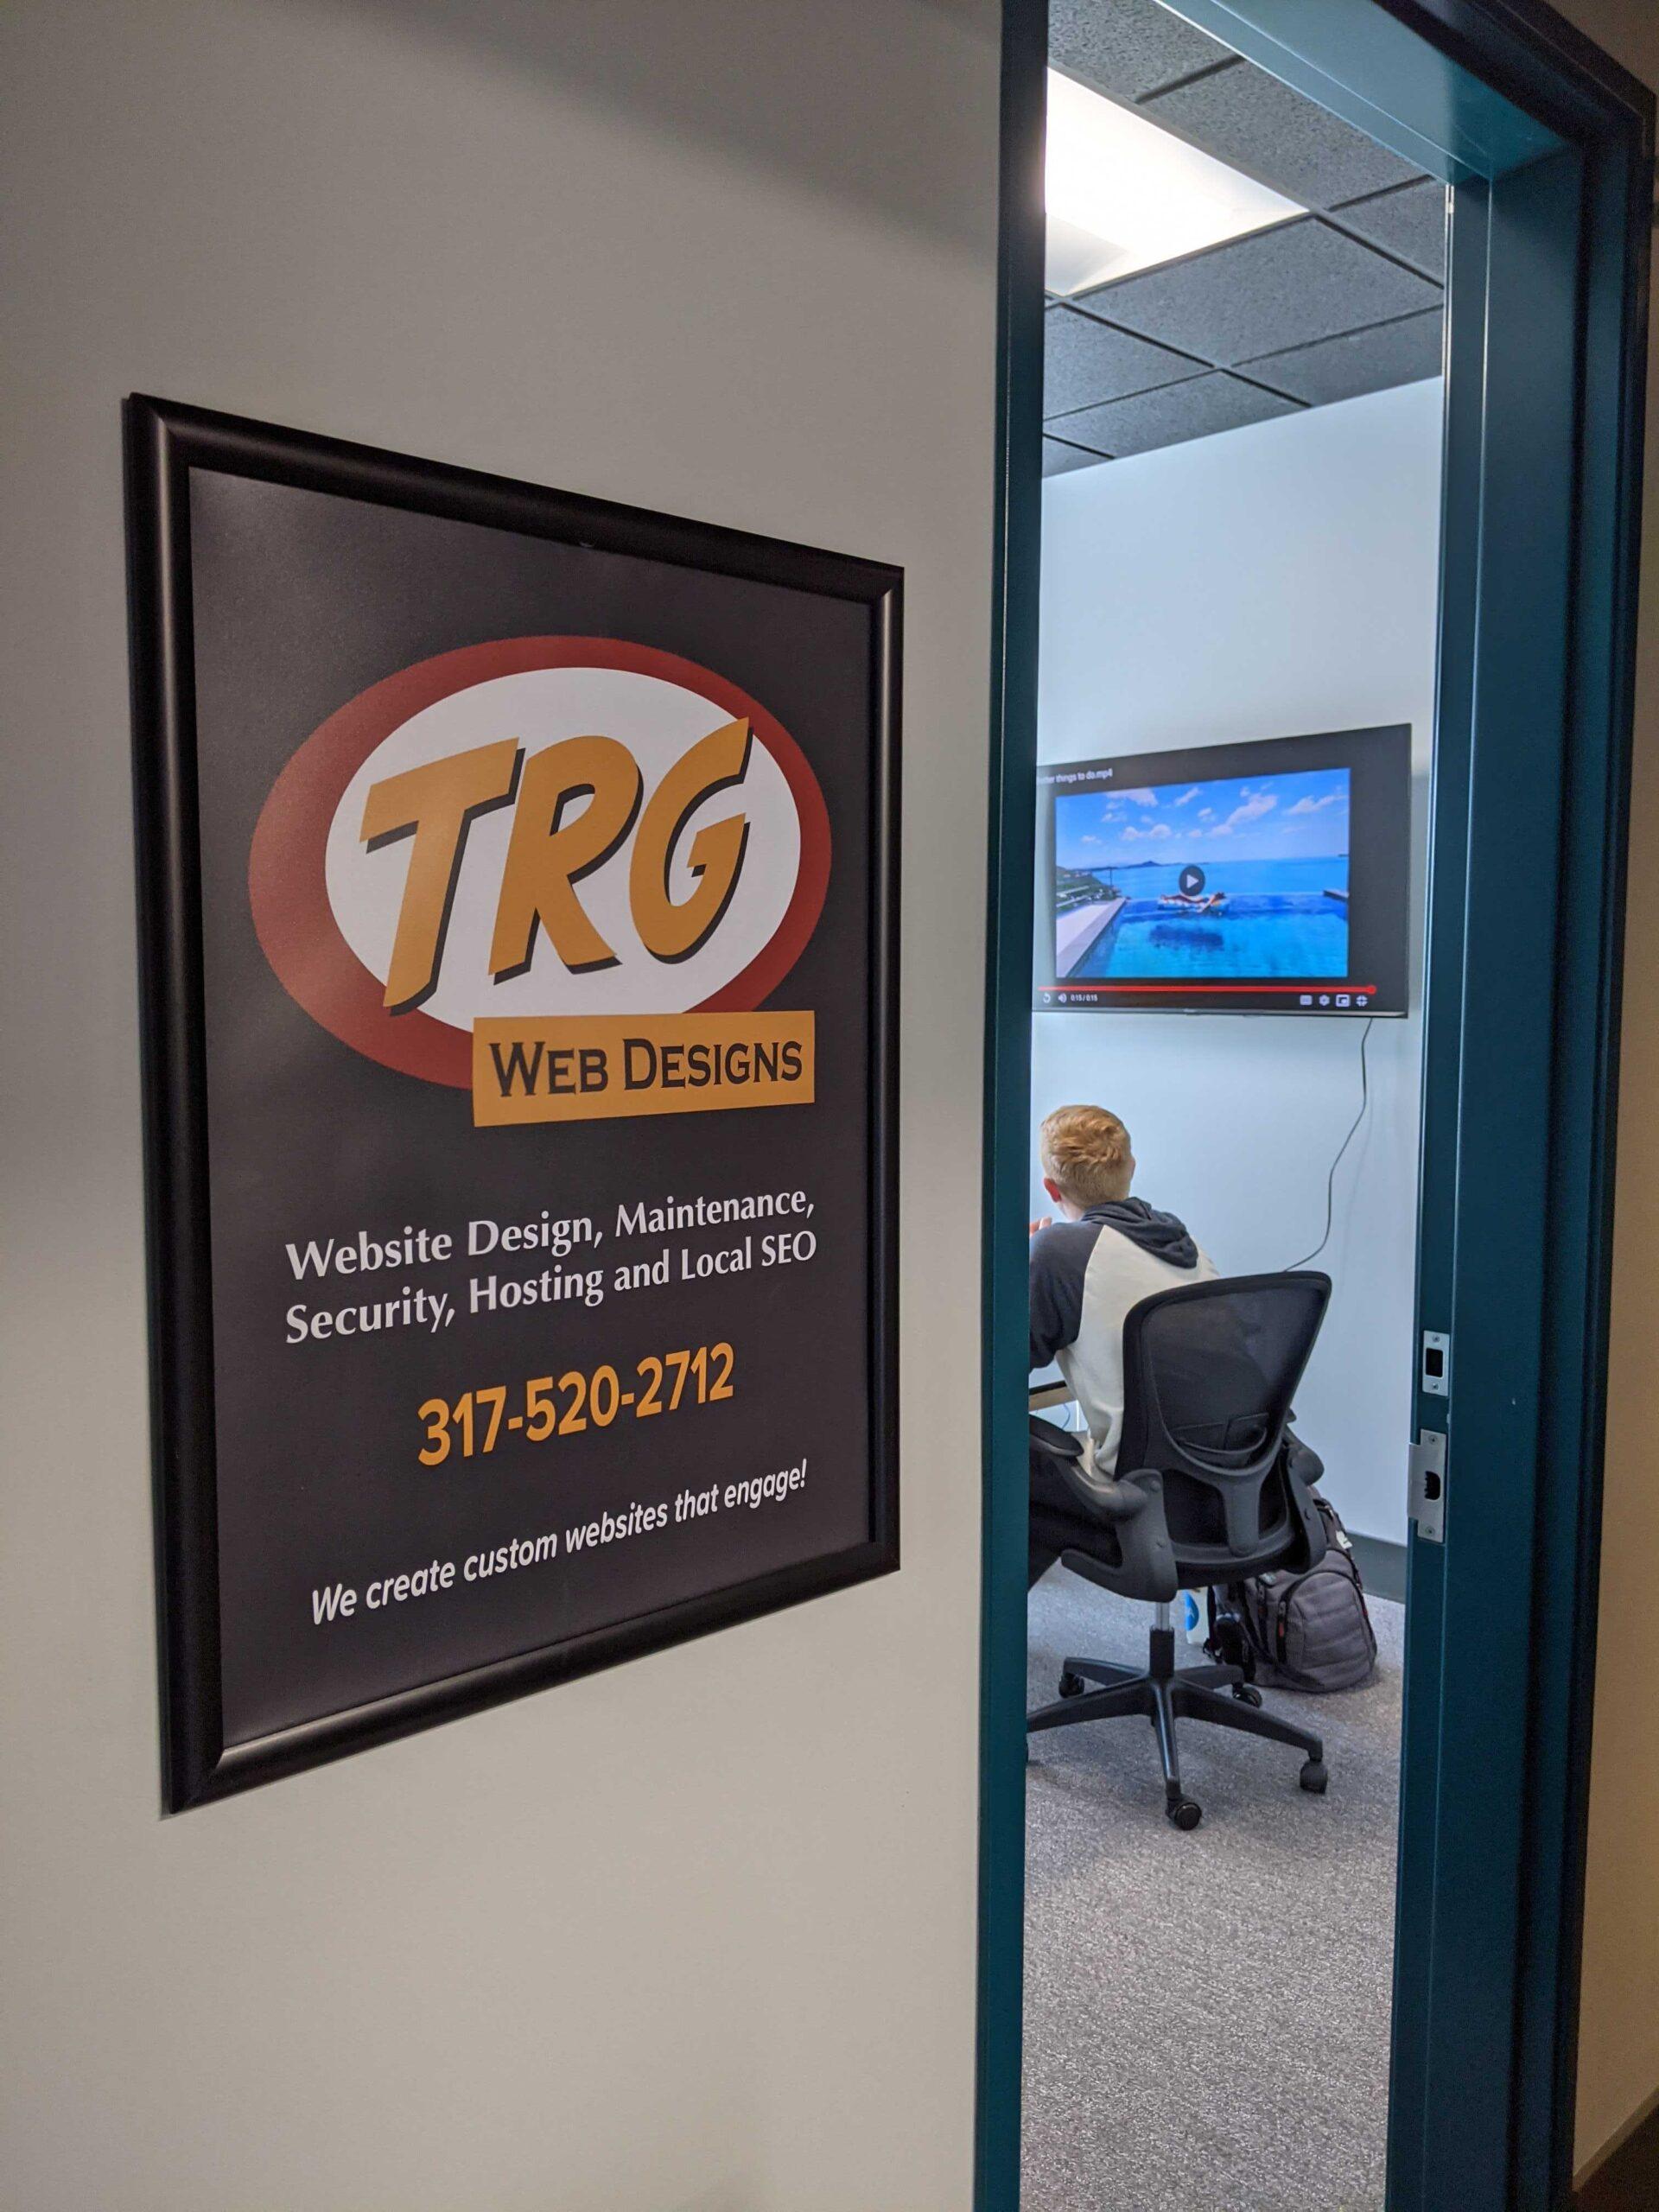 TRG Web Designs Office